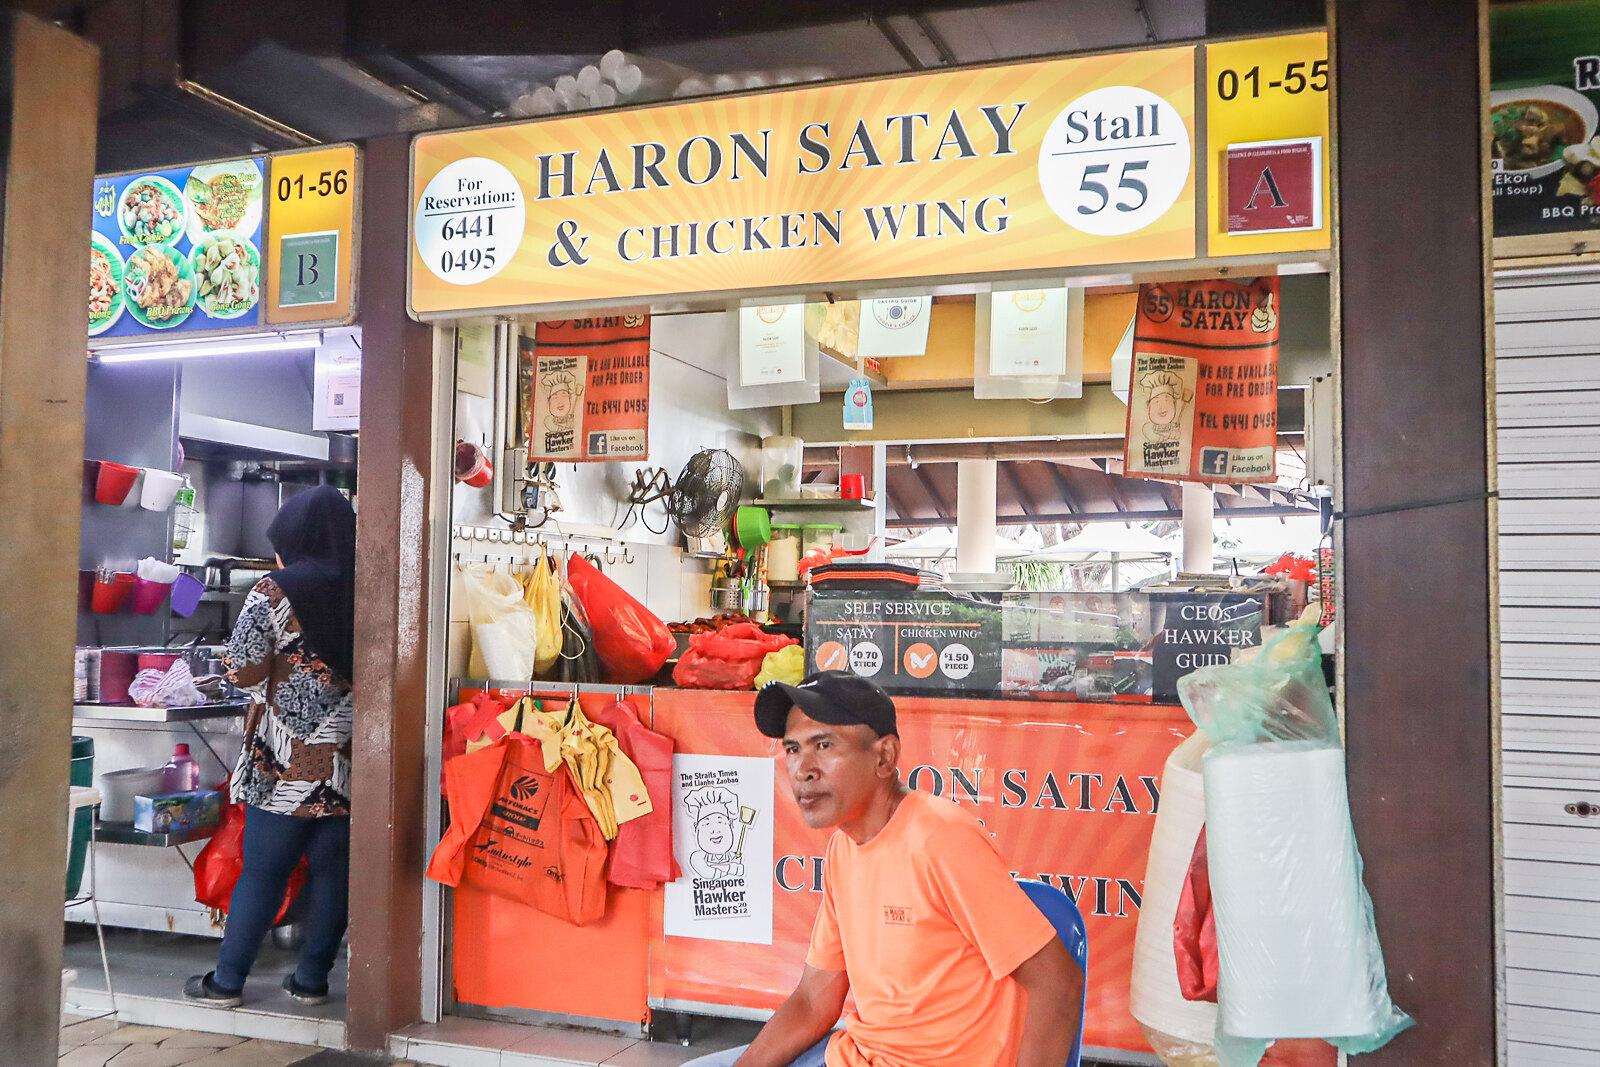 East Coast Lagoon - Haron Satay storefront